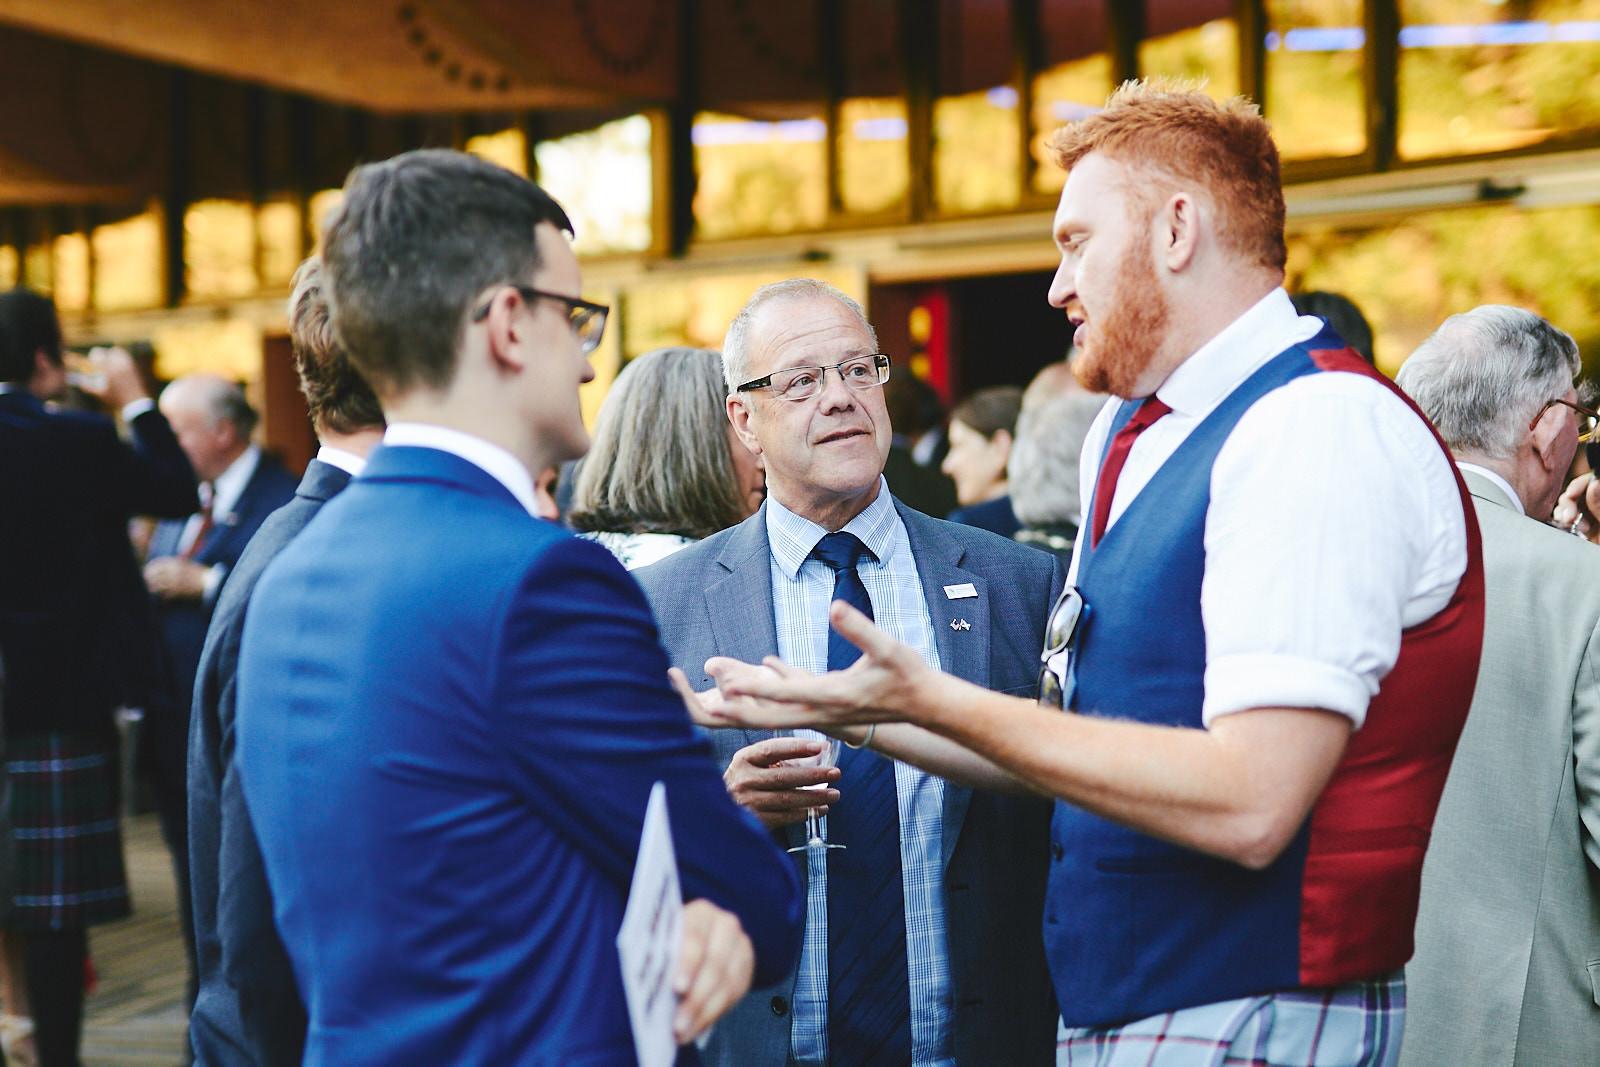 US consulate Edinburgh 4th of July celebration 2018 - 204 web.jpg